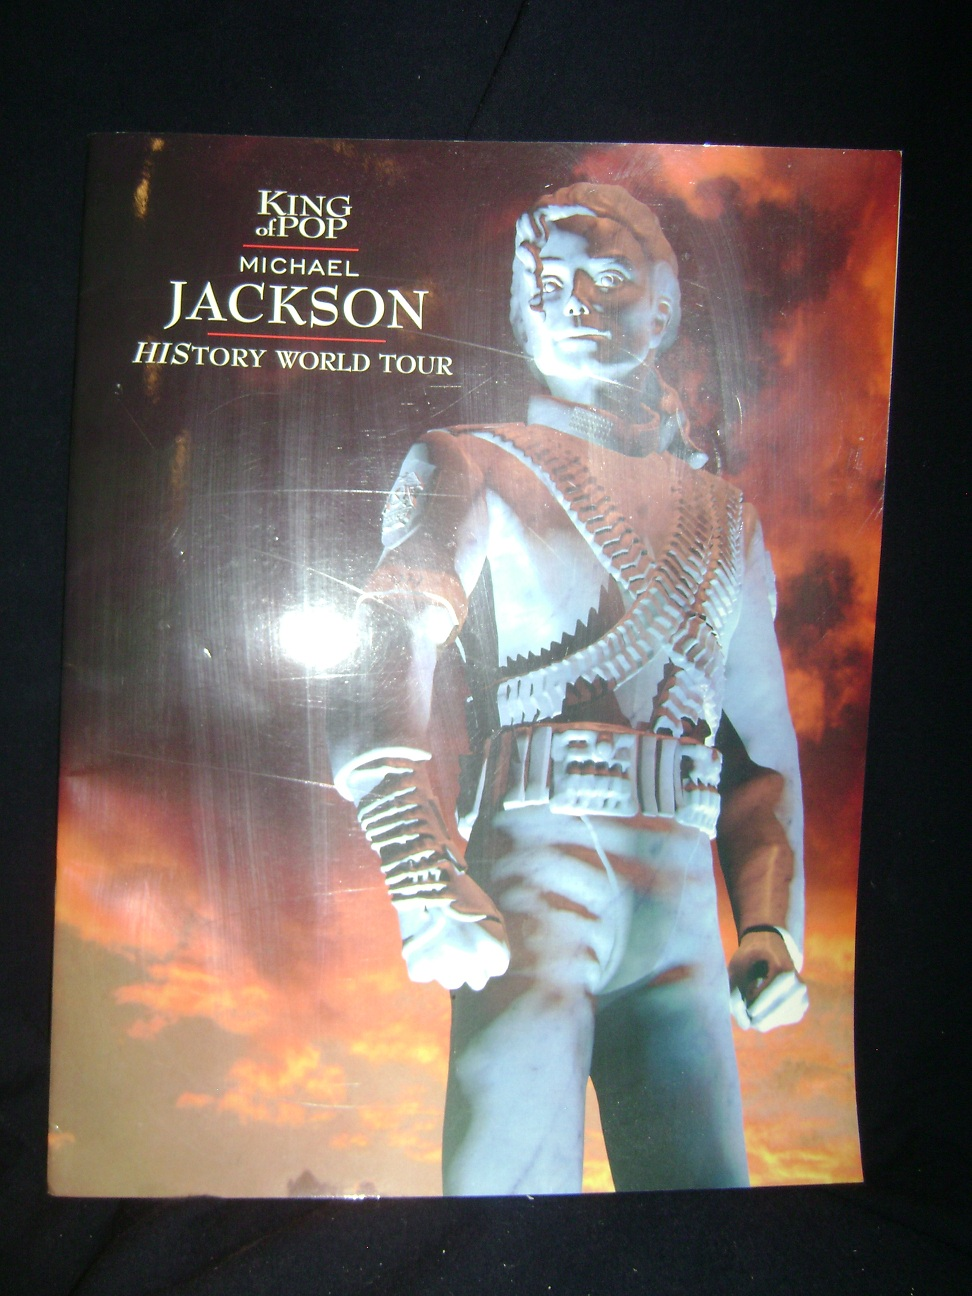 Michael_Jackson_King_of_pop_1.JPG